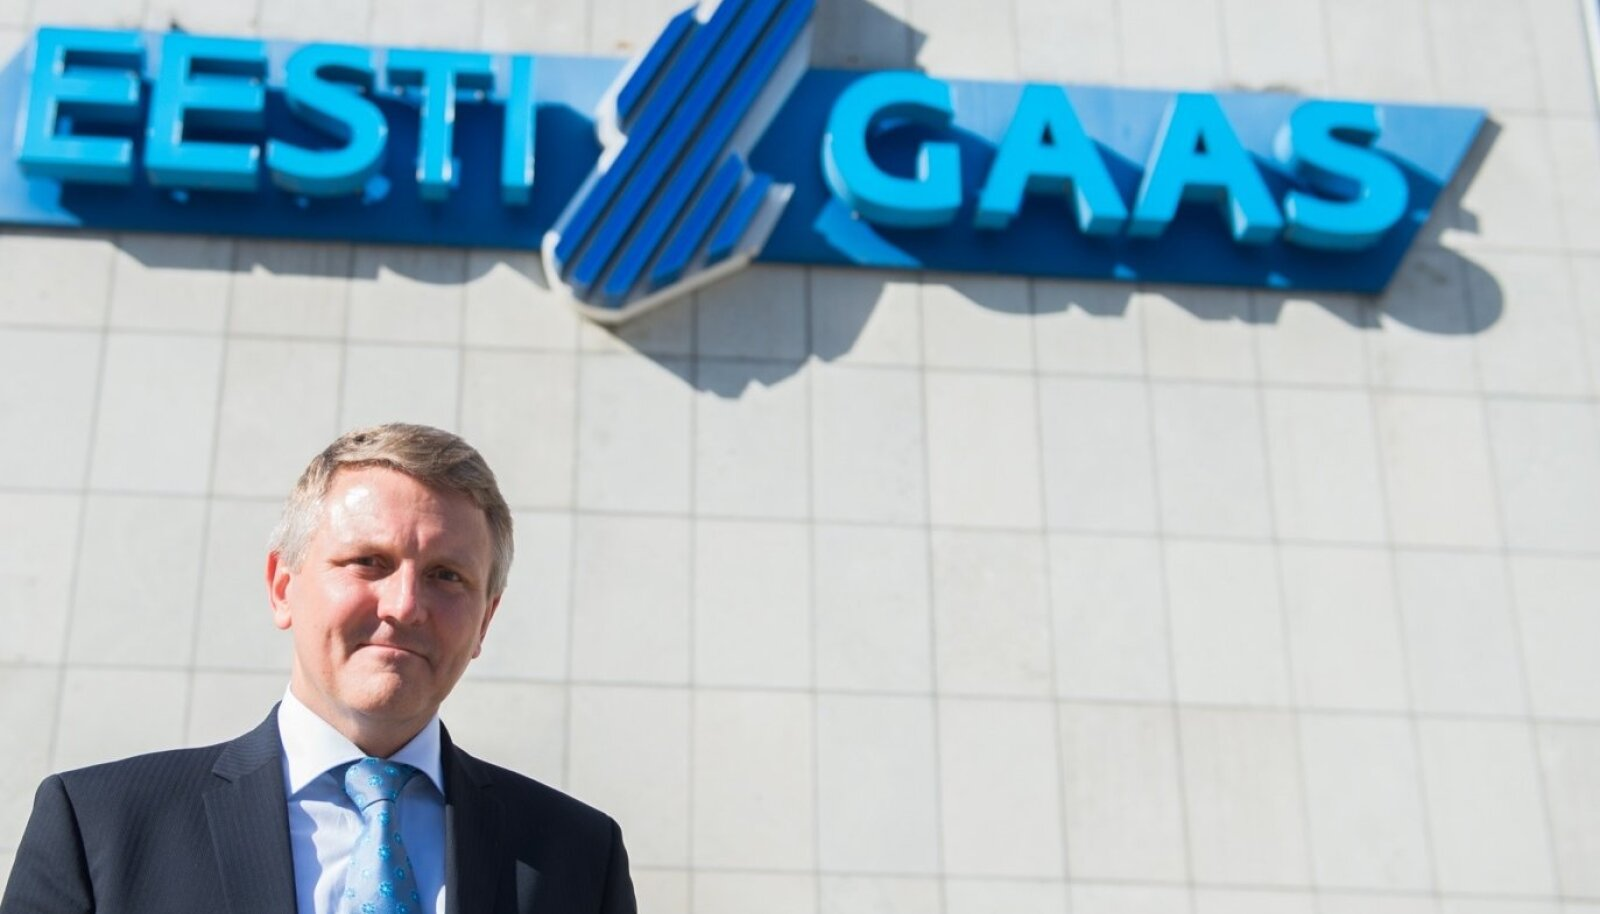 Eesti Gaasi uus juht, endine kantsler Ants Noot.